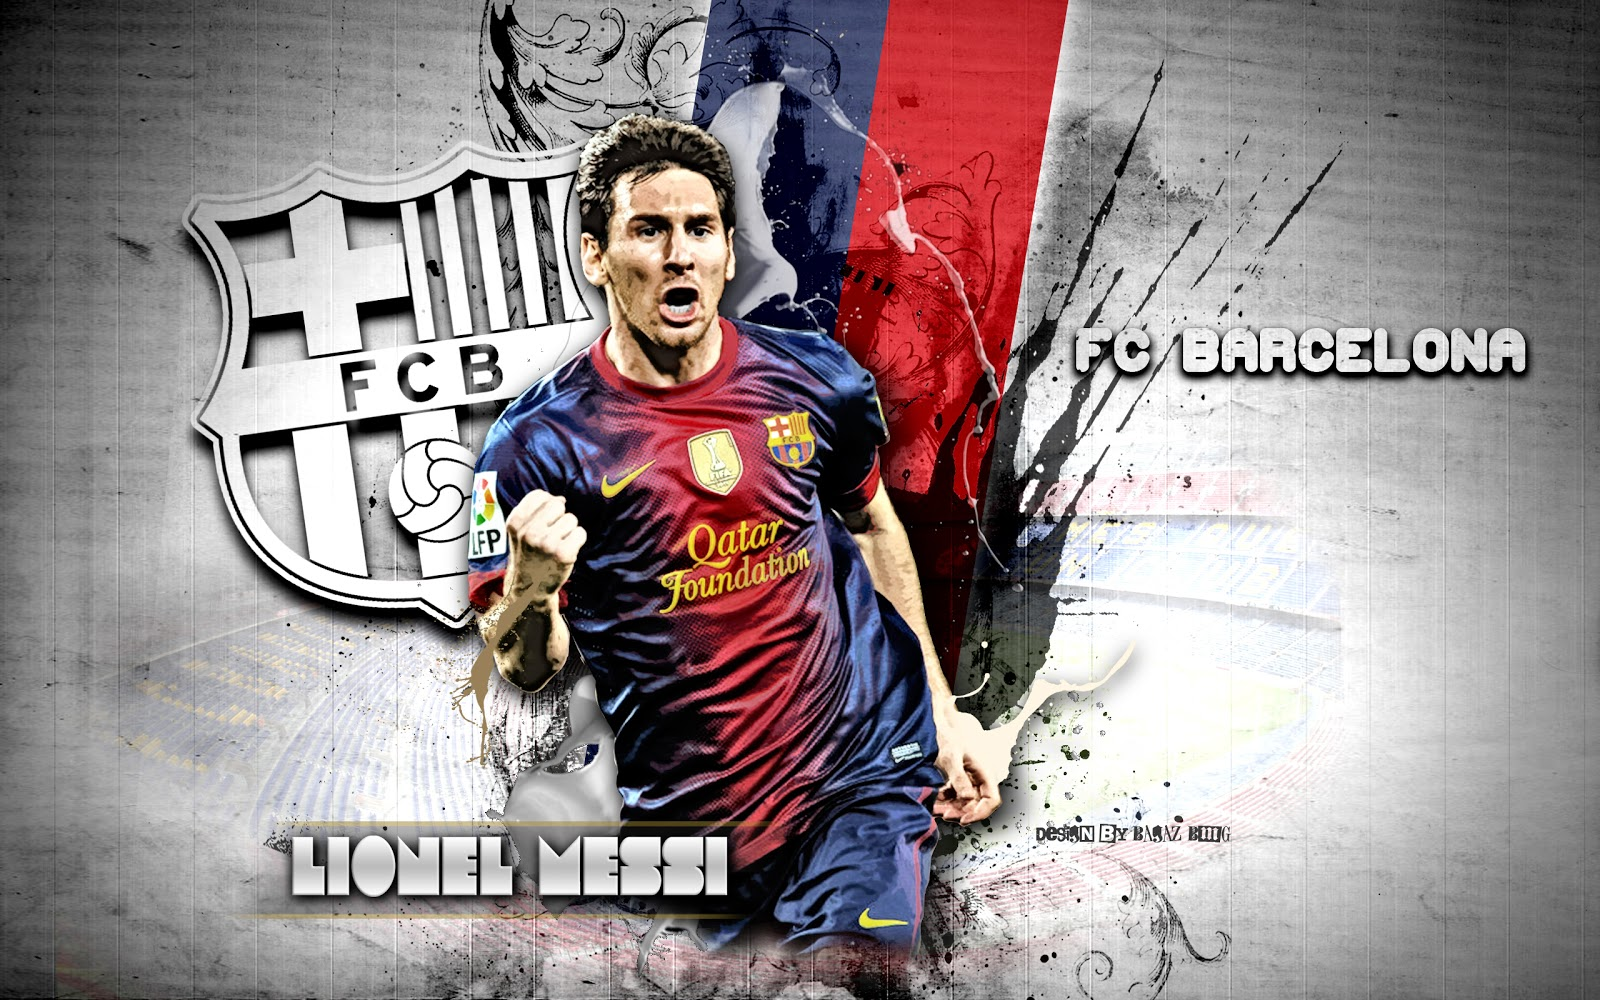 Beautiful HD wallpaper Barcelona FC 2013 Lionel Messi 1600x1000